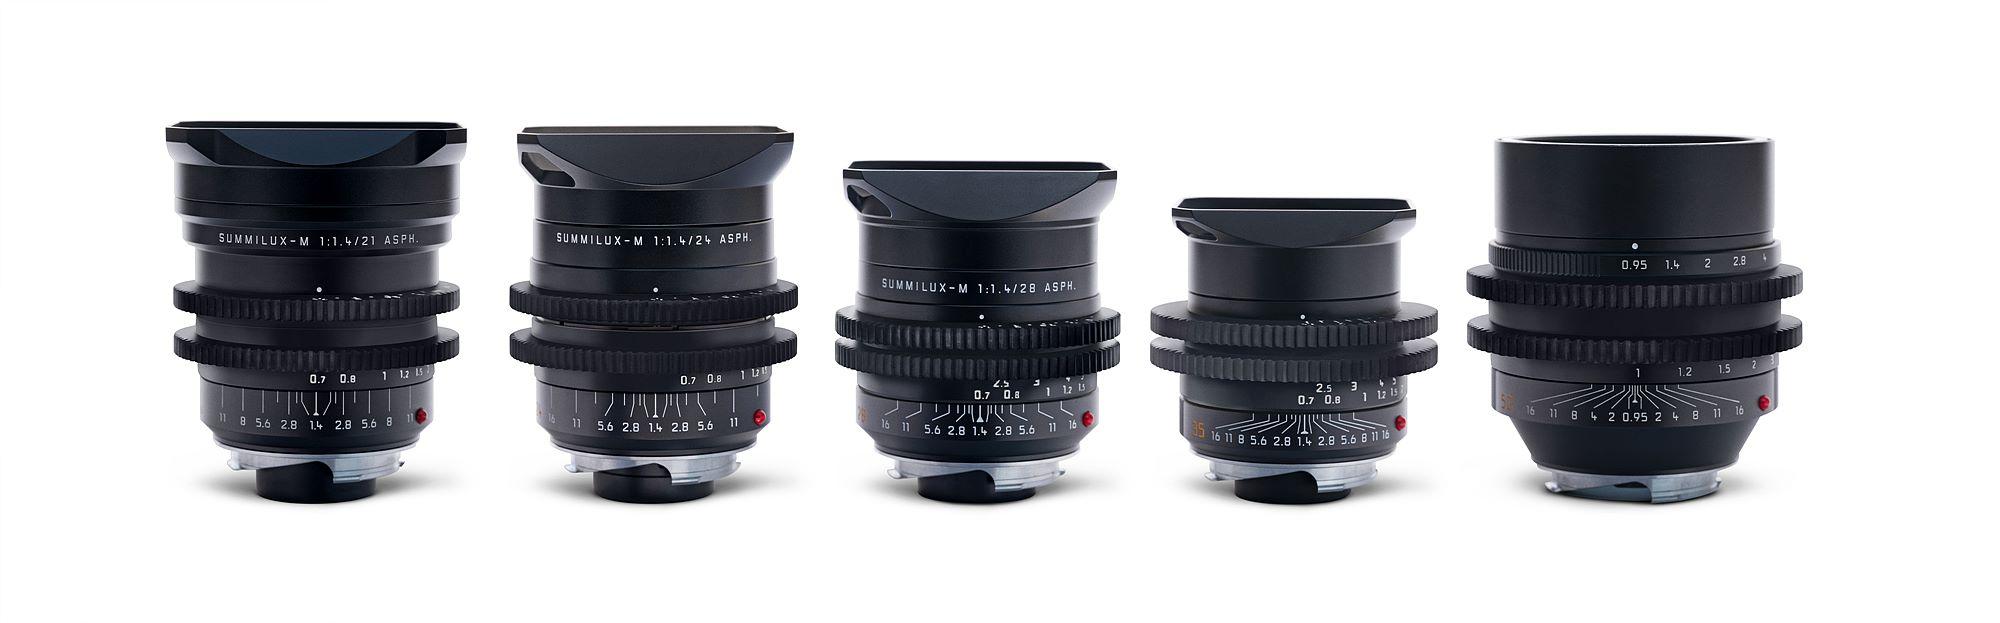 Leica M 0.8 렌즈 21mm f/1.4, 24mm f/1.4, 28mm f/1.4, 35mm f/1.4, 50mm f/0.95 Noctilux